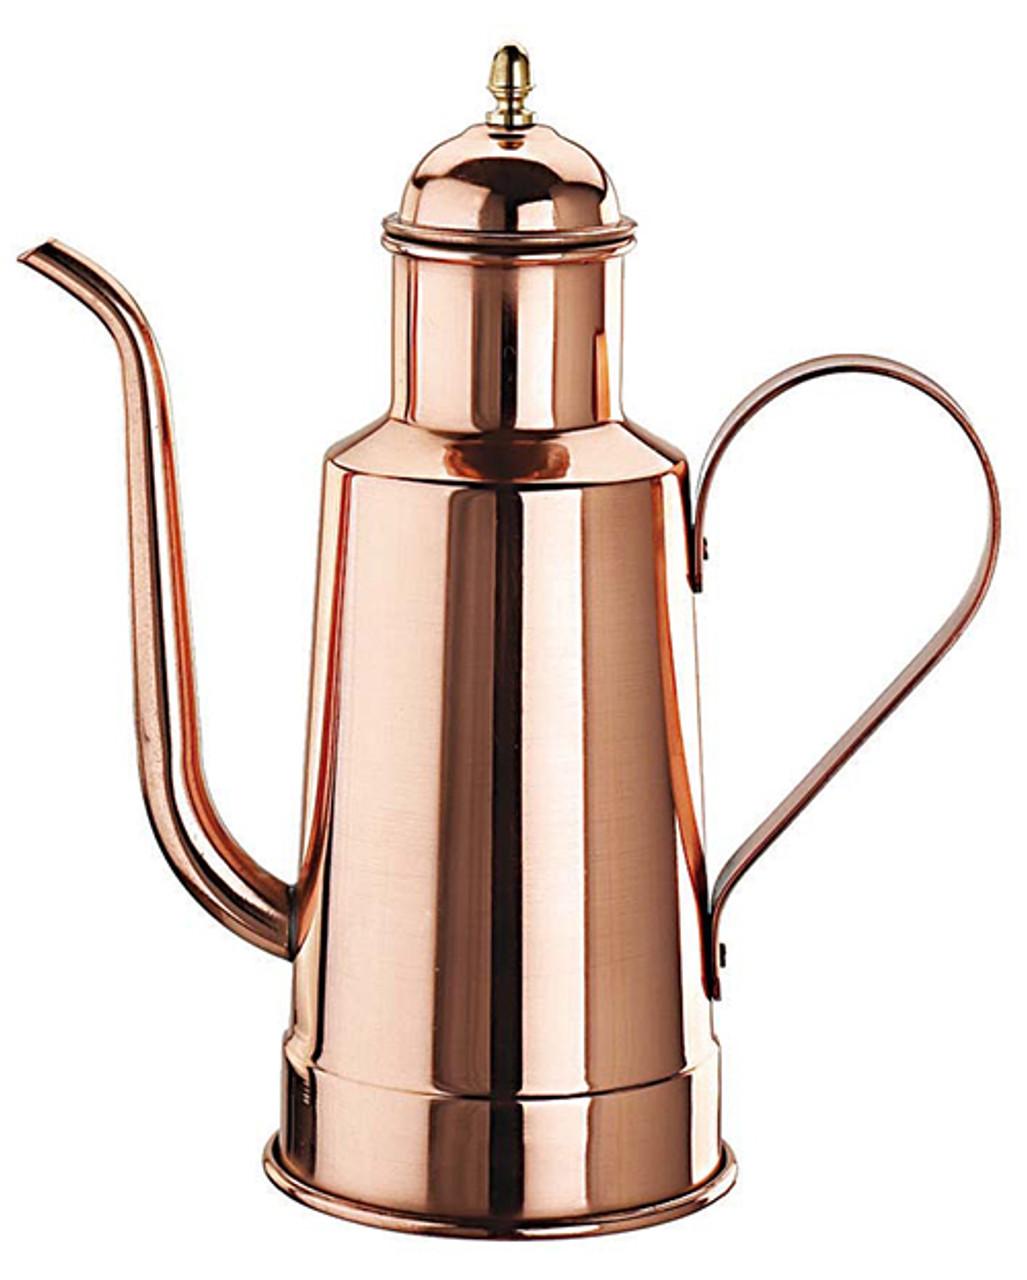 "Copper/Tin Oil Dispenser, H 10 5/8"", 1 1/8 QTS"